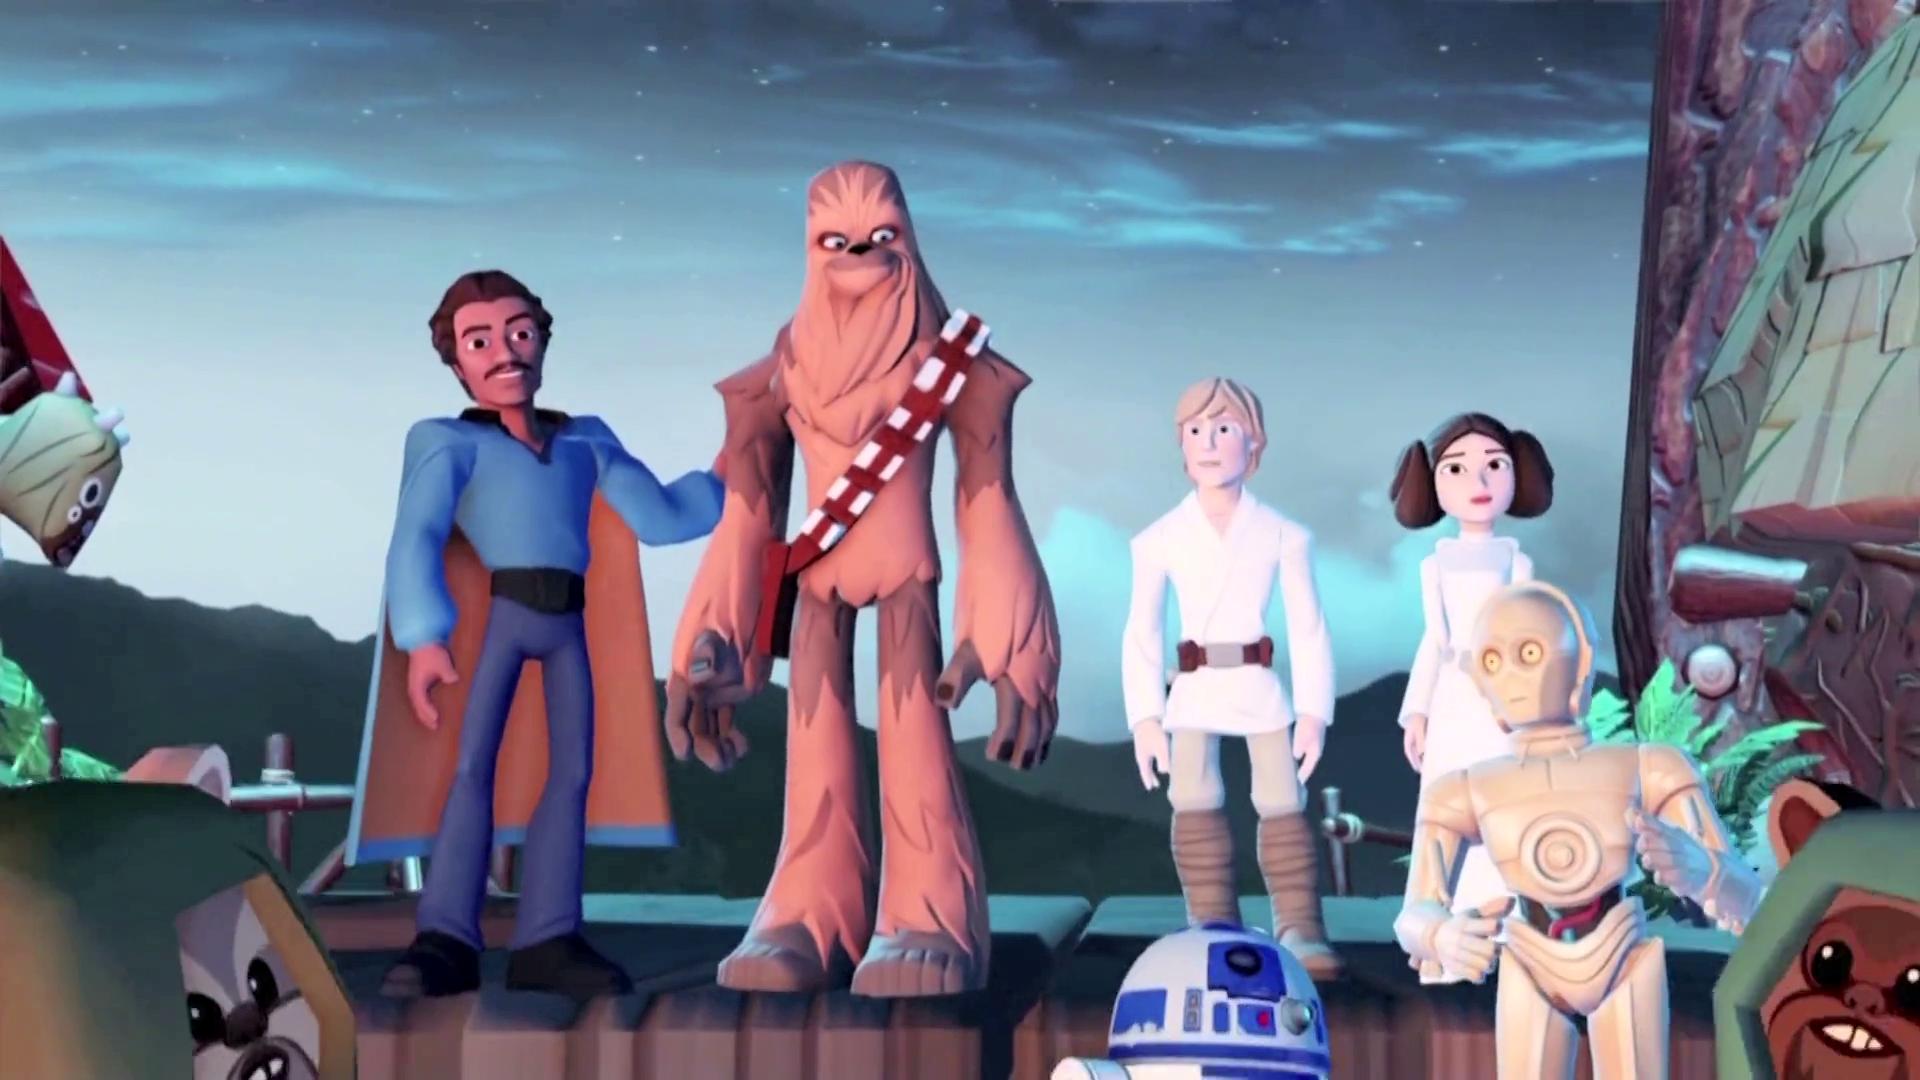 Take the Star Wars Disney Infinity 3.0 Animation Tour